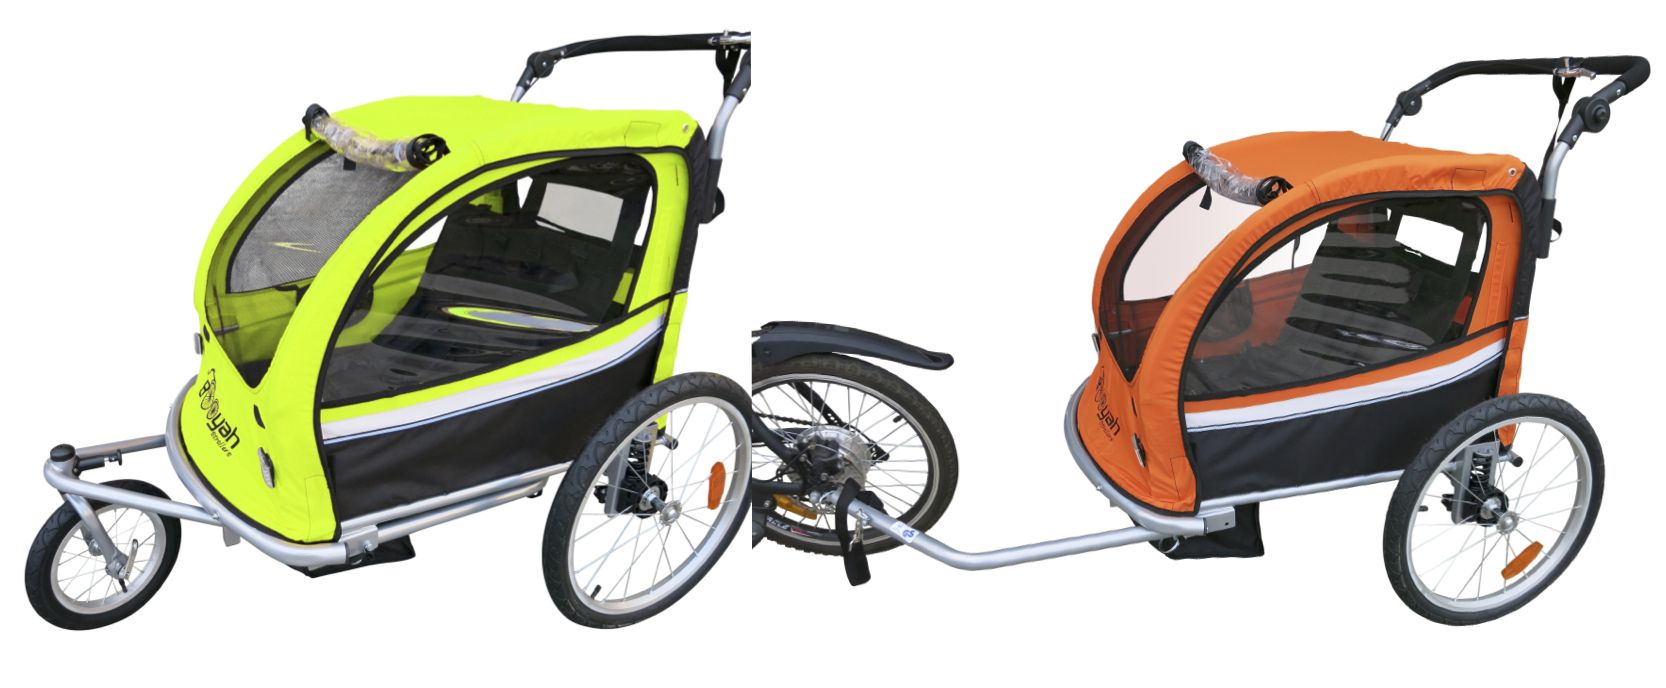 Child II Pet stroller, Baby strollers, Bike